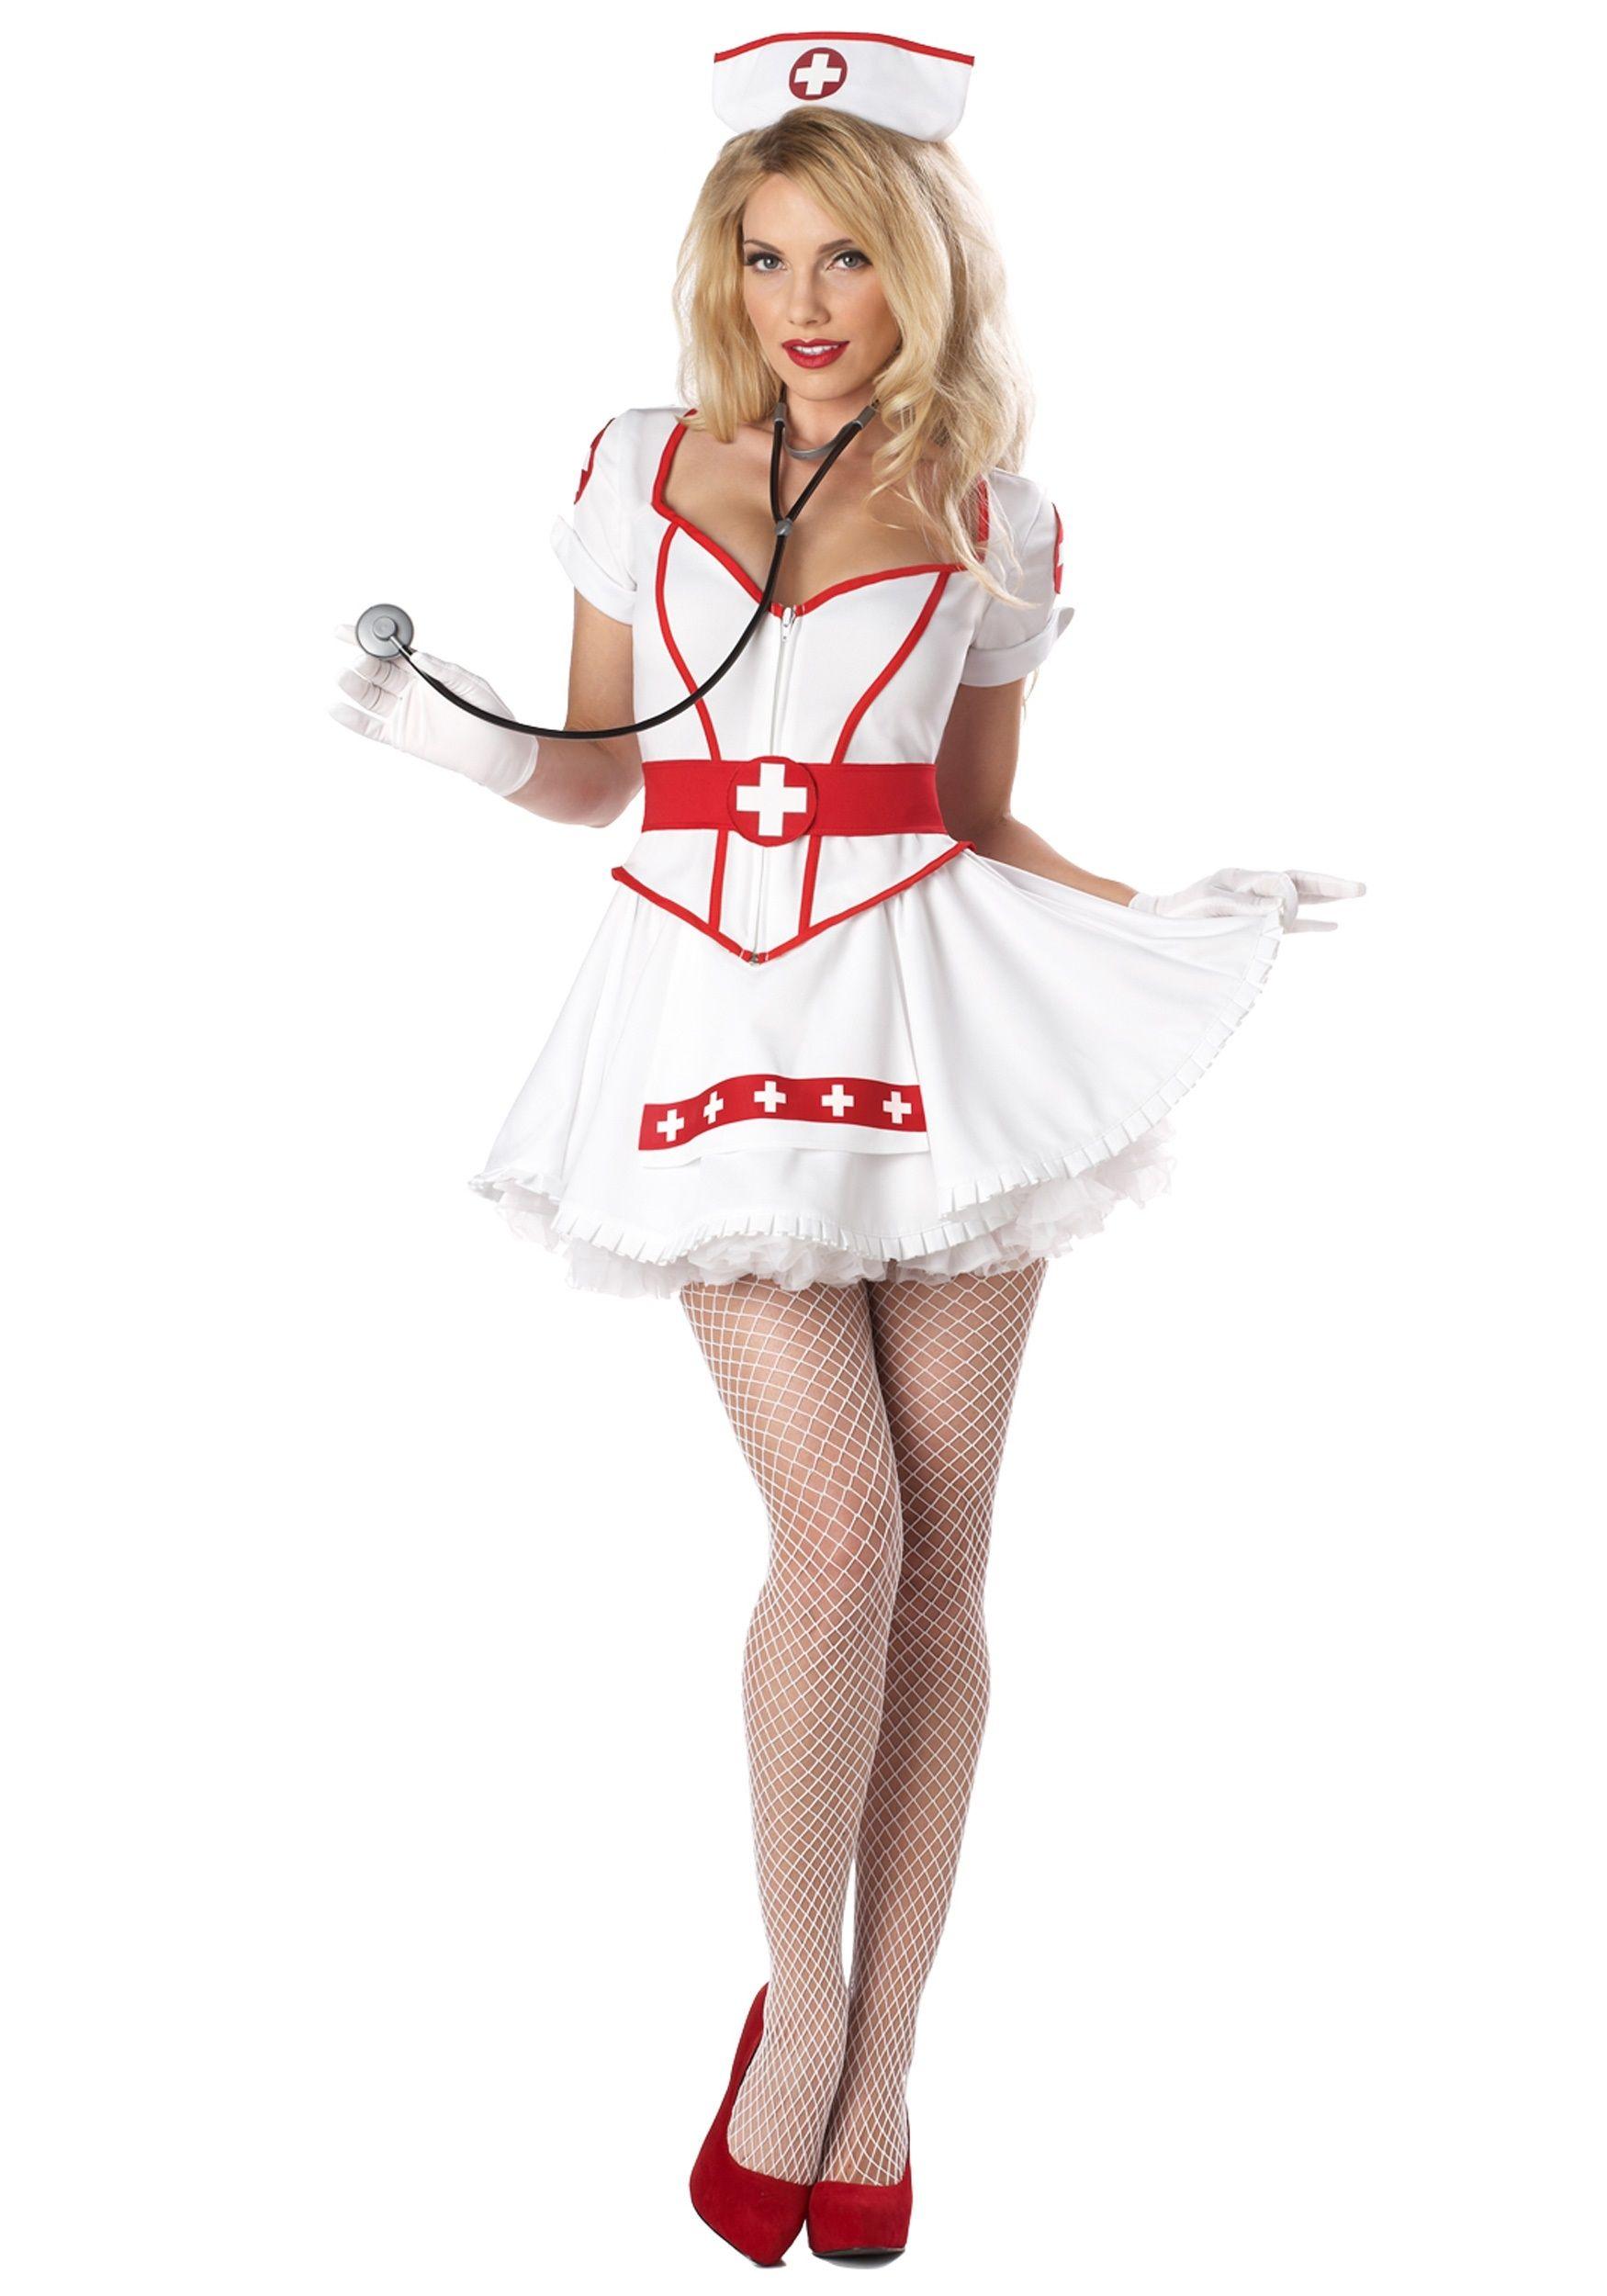 У пышнай медсестры под халатом